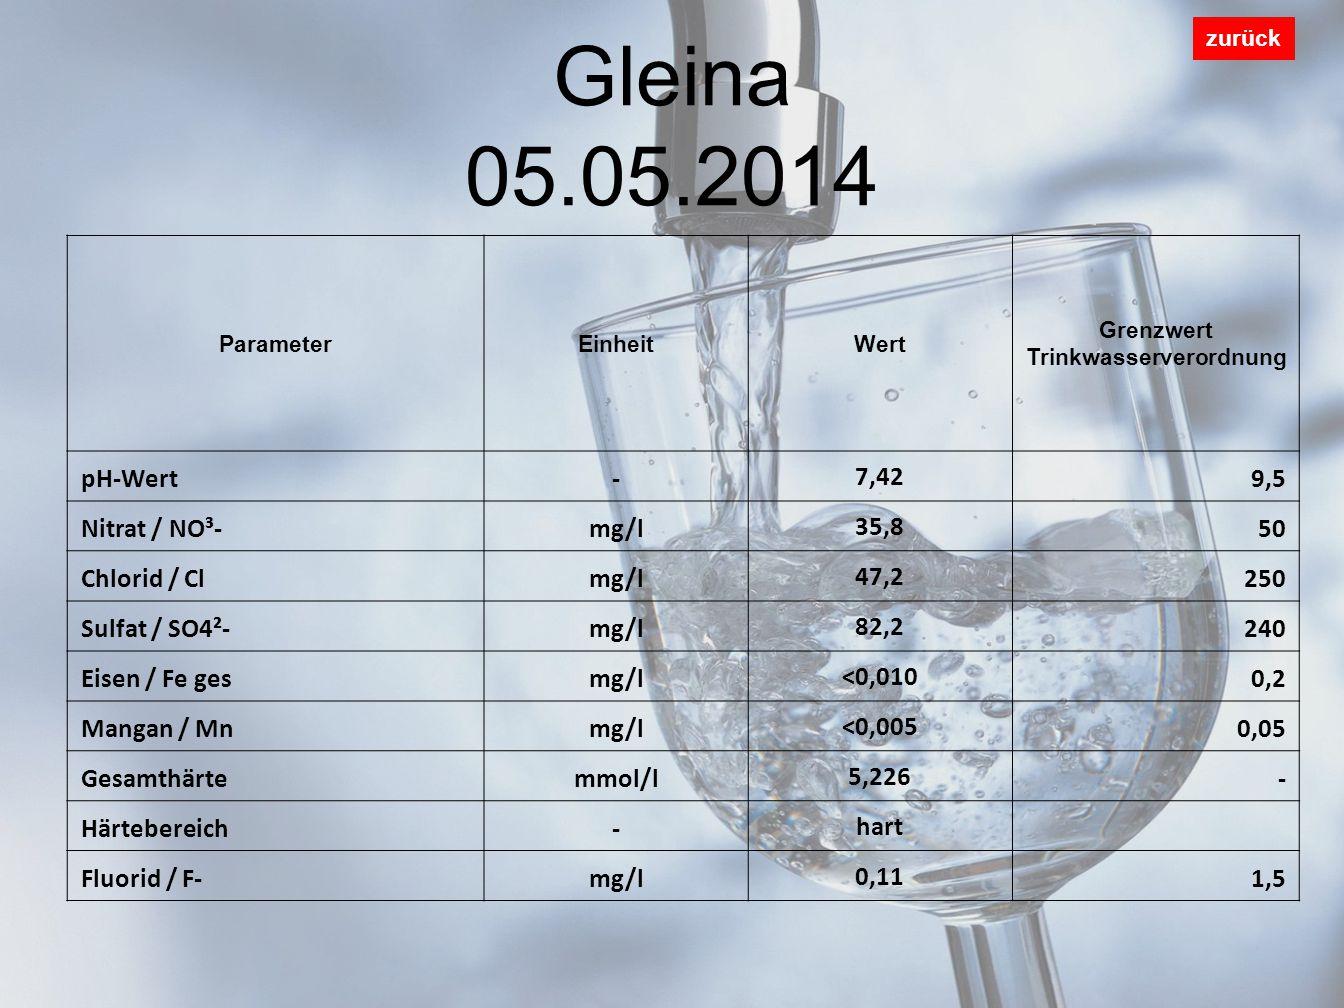 Gleina 05.05.2014 zurück ParameterEinheitWert Grenzwert Trinkwasserverordnung pH-Wert- 7,42 9,5 Nitrat / NO³-mg/l 35,8 50 Chlorid / Clmg/l 47,2 250 Sulfat / SO4²-mg/l 82,2 240 Eisen / Fe gesmg/l <0,010 0,2 Mangan / Mnmg/l <0,005 0,05 Gesamthärtemmol/l 5,226 - Härtebereich- hart Fluorid / F-mg/l 0,11 1,5